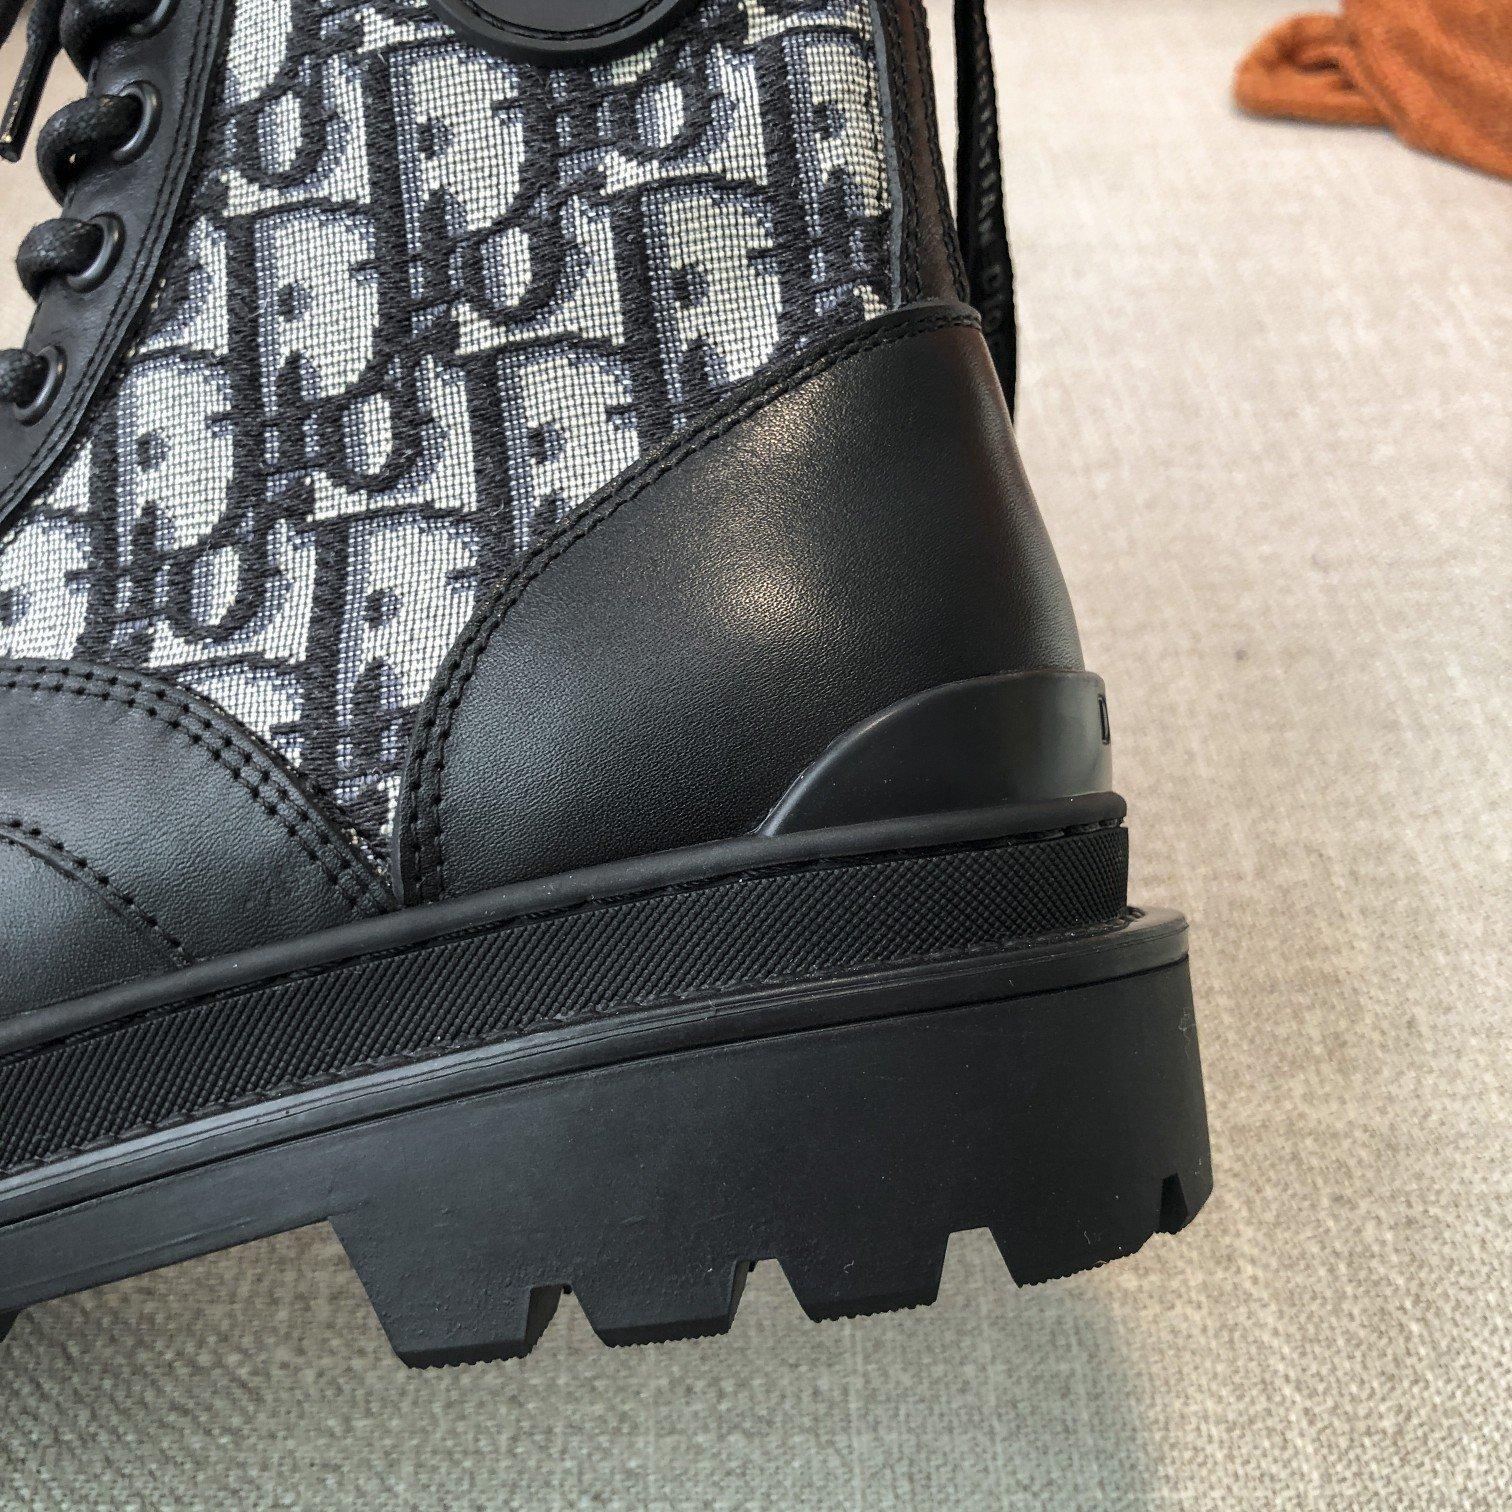 Dior高版本情侣 款2020ss秋冬新款字母厚底系带机车靴,秋冬T台走秀同款(图9)